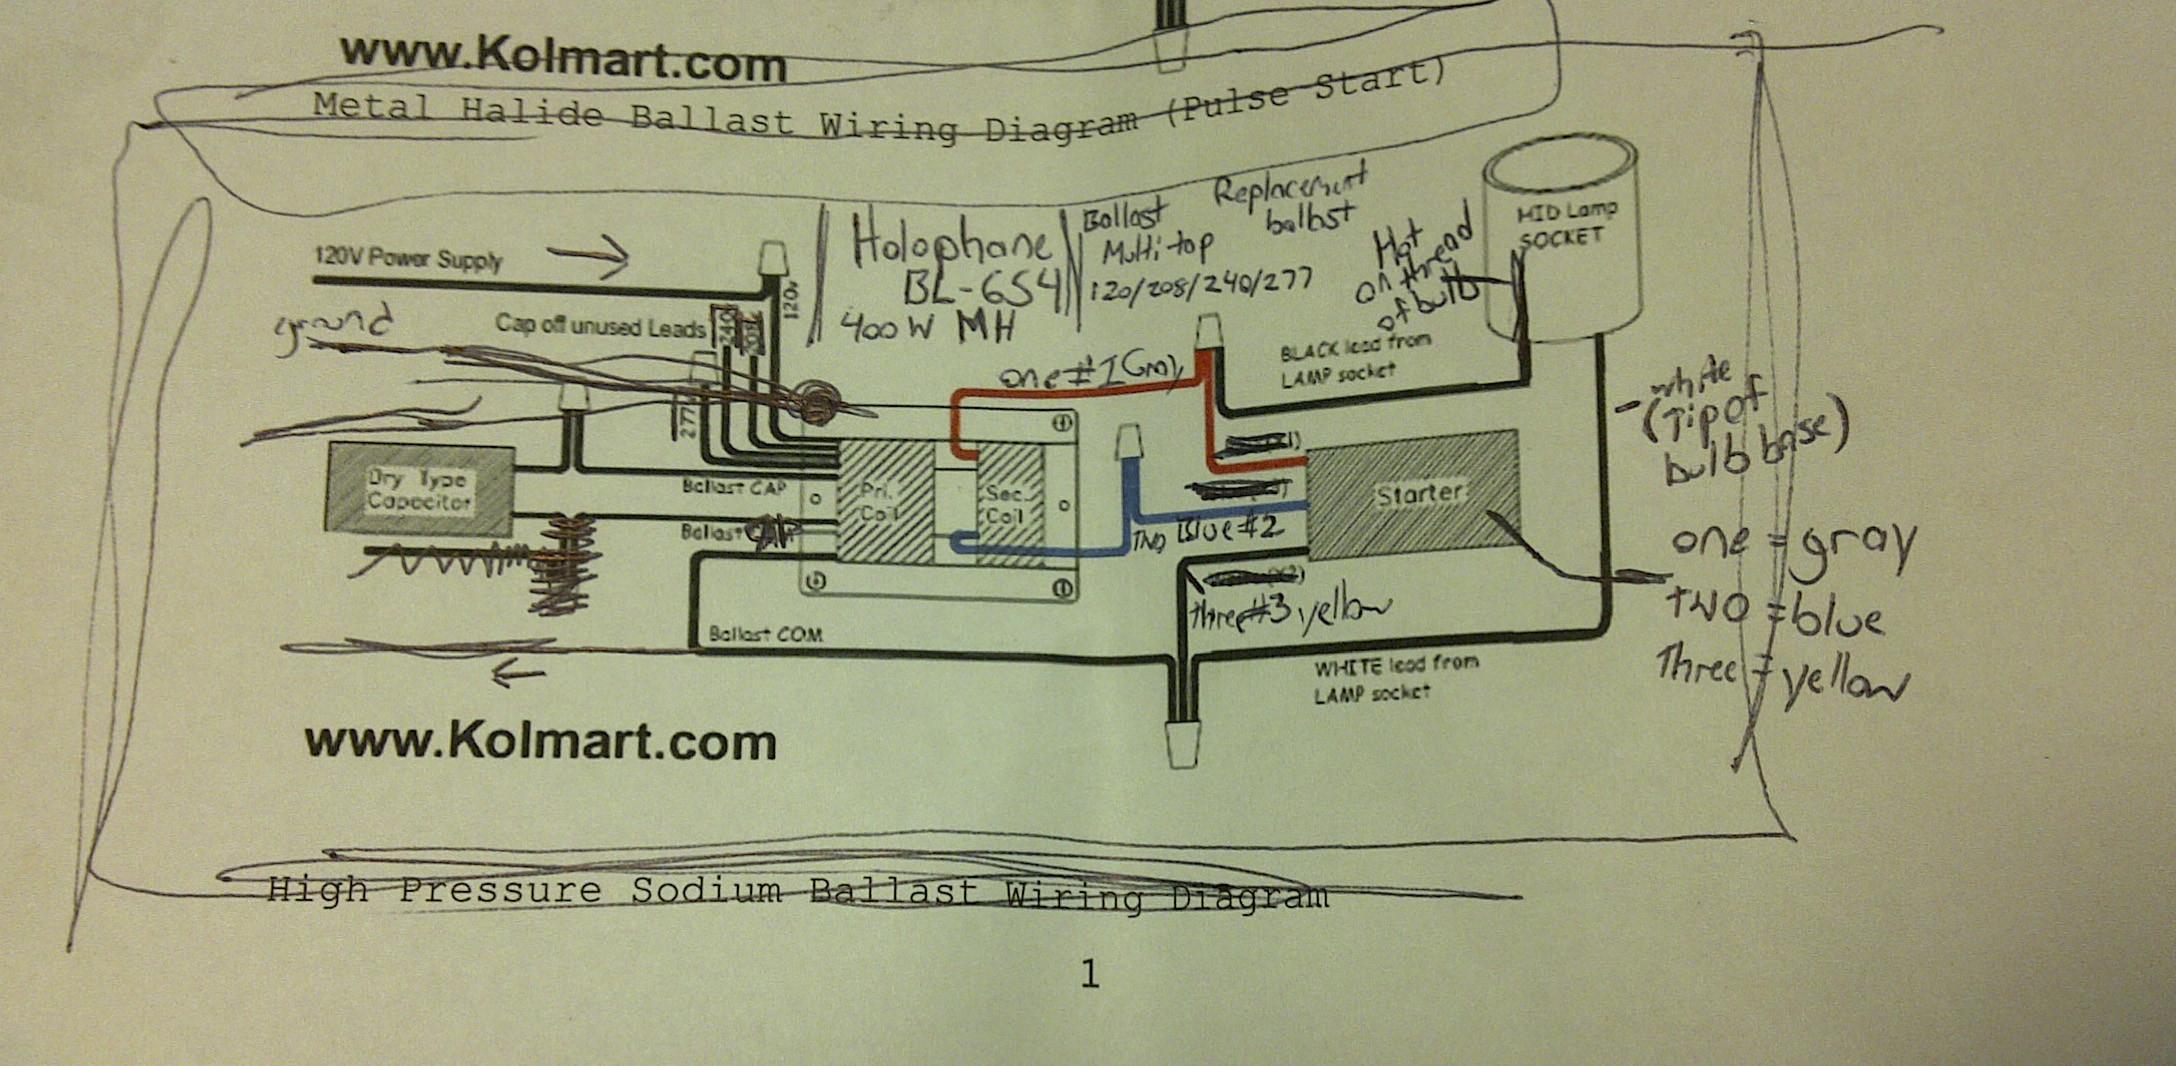 DIAGRAM] 480 Volt Metal Halide Wiring Diagram FULL Version HD Quality Wiring  Diagram - AUTONETDIAGRAM.GIANNIROGHI.ITgianniroghi